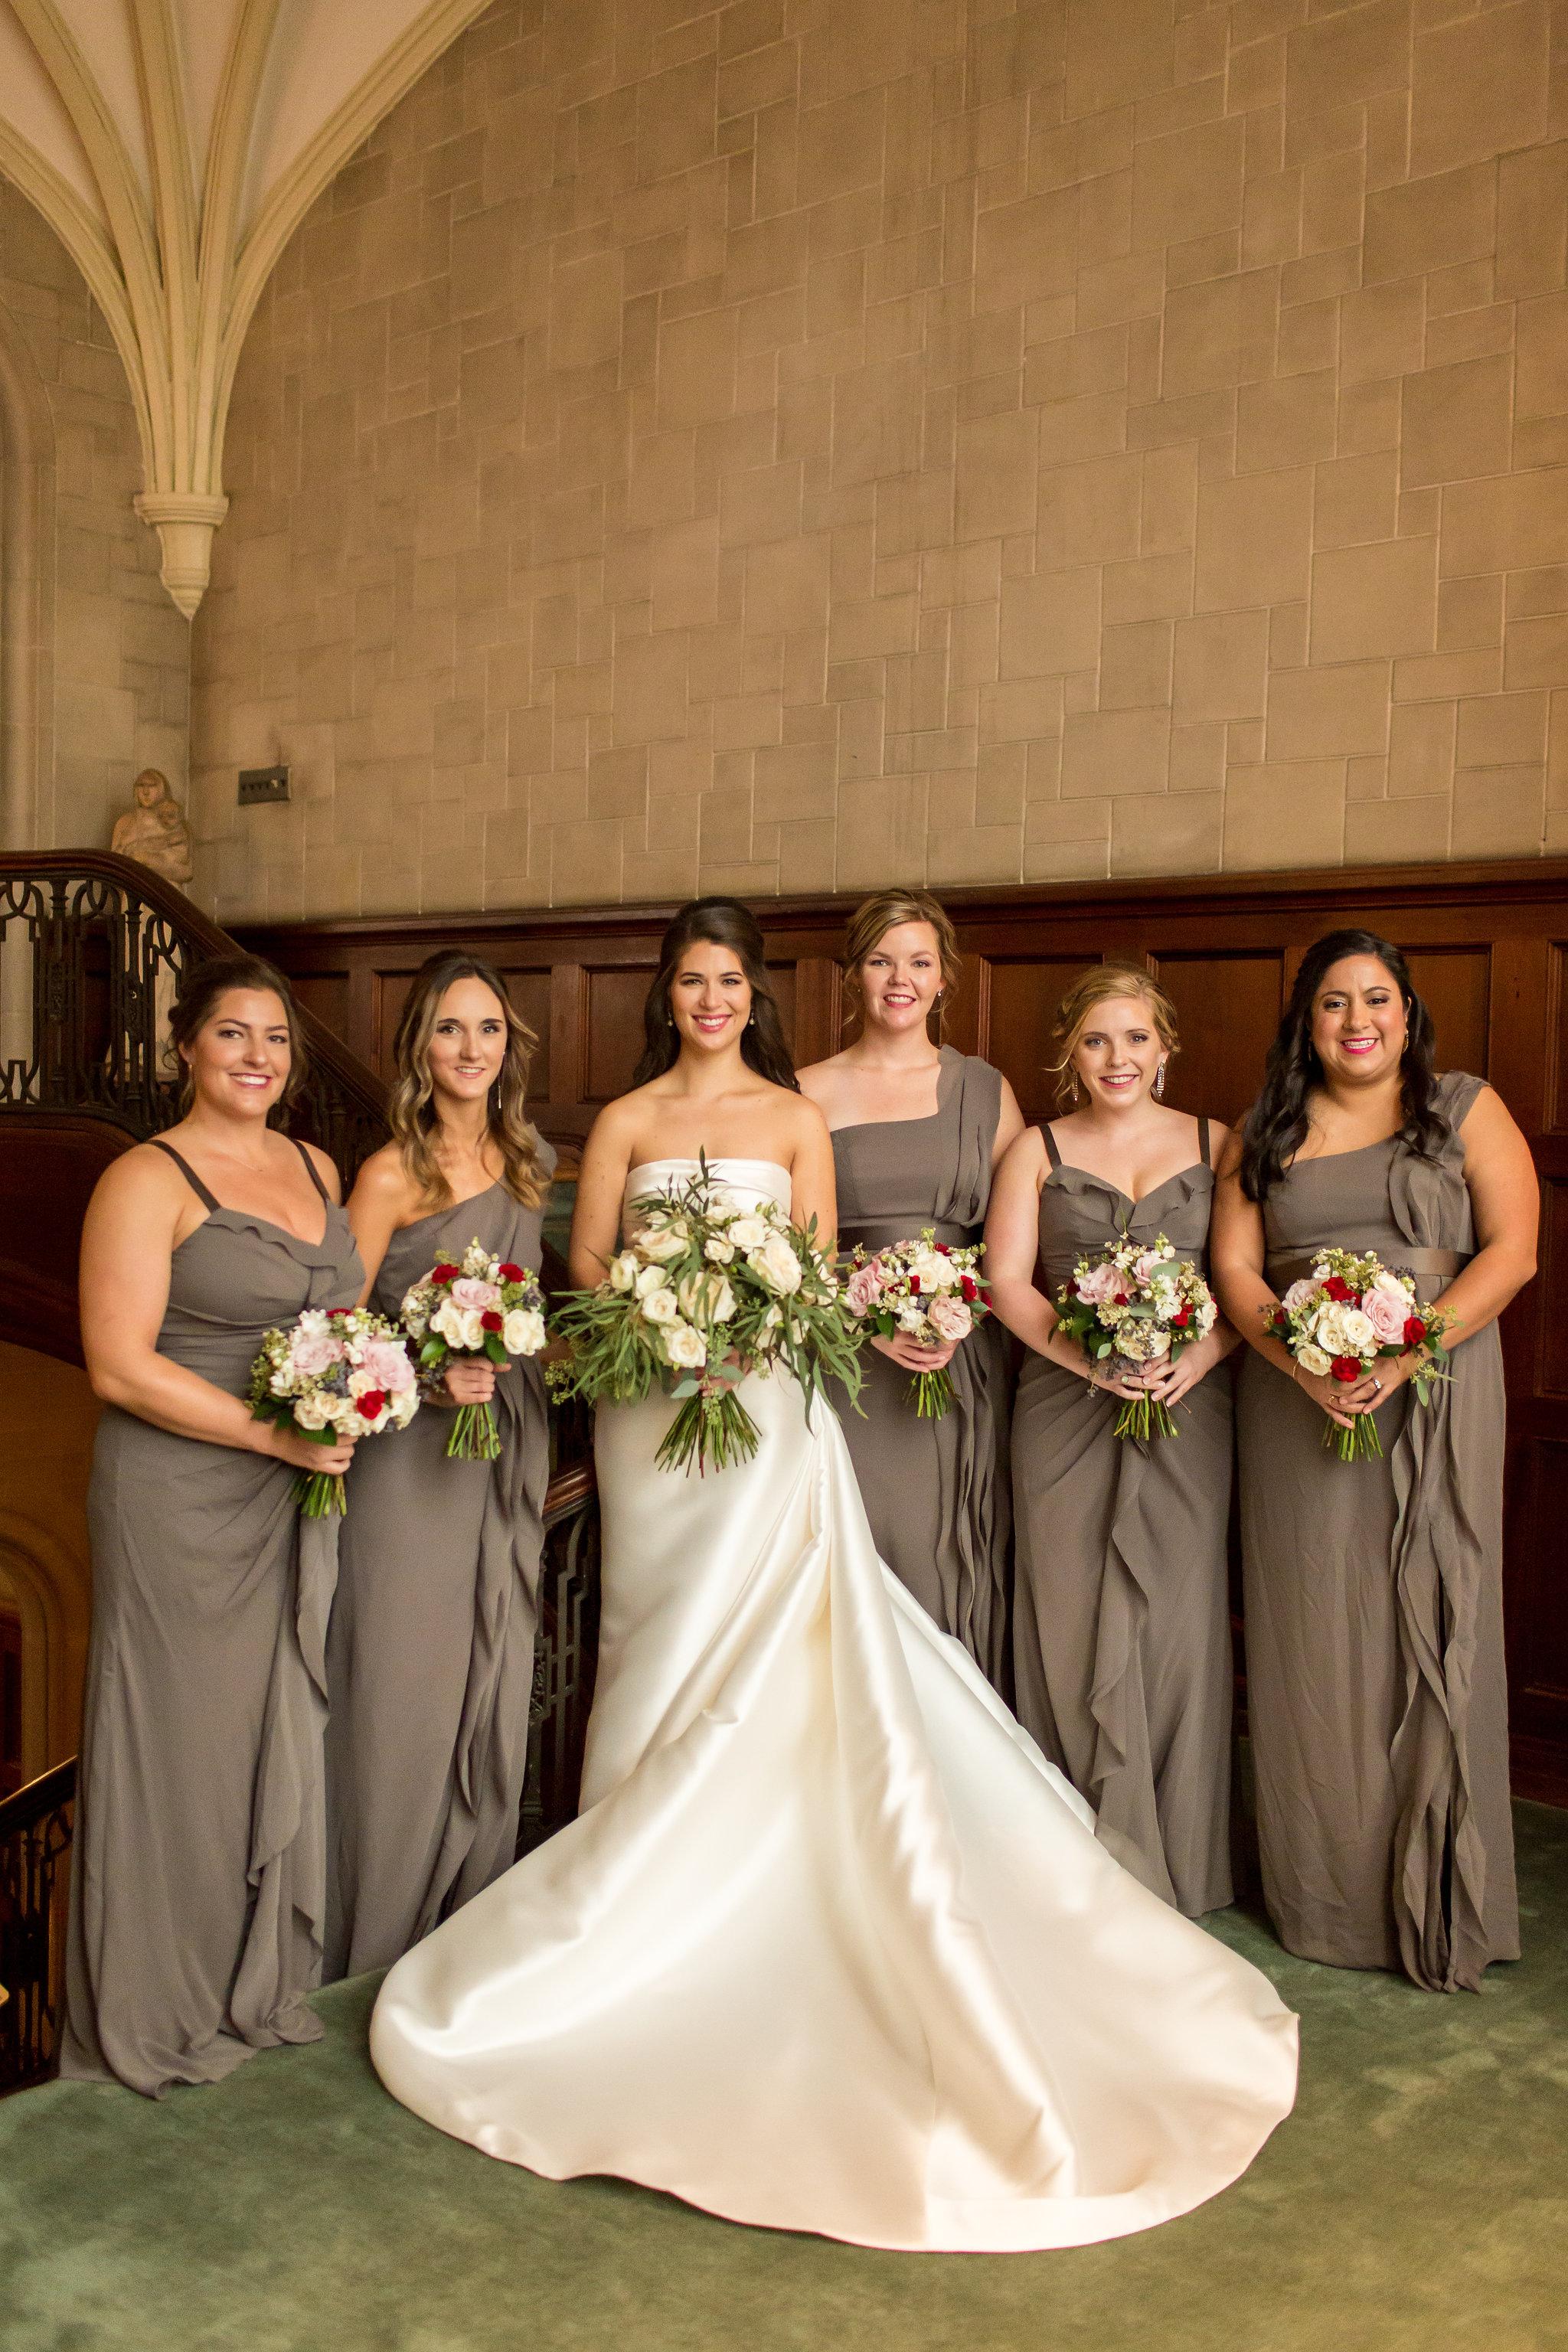 NessWedding-Bridesmaids-1.jpg